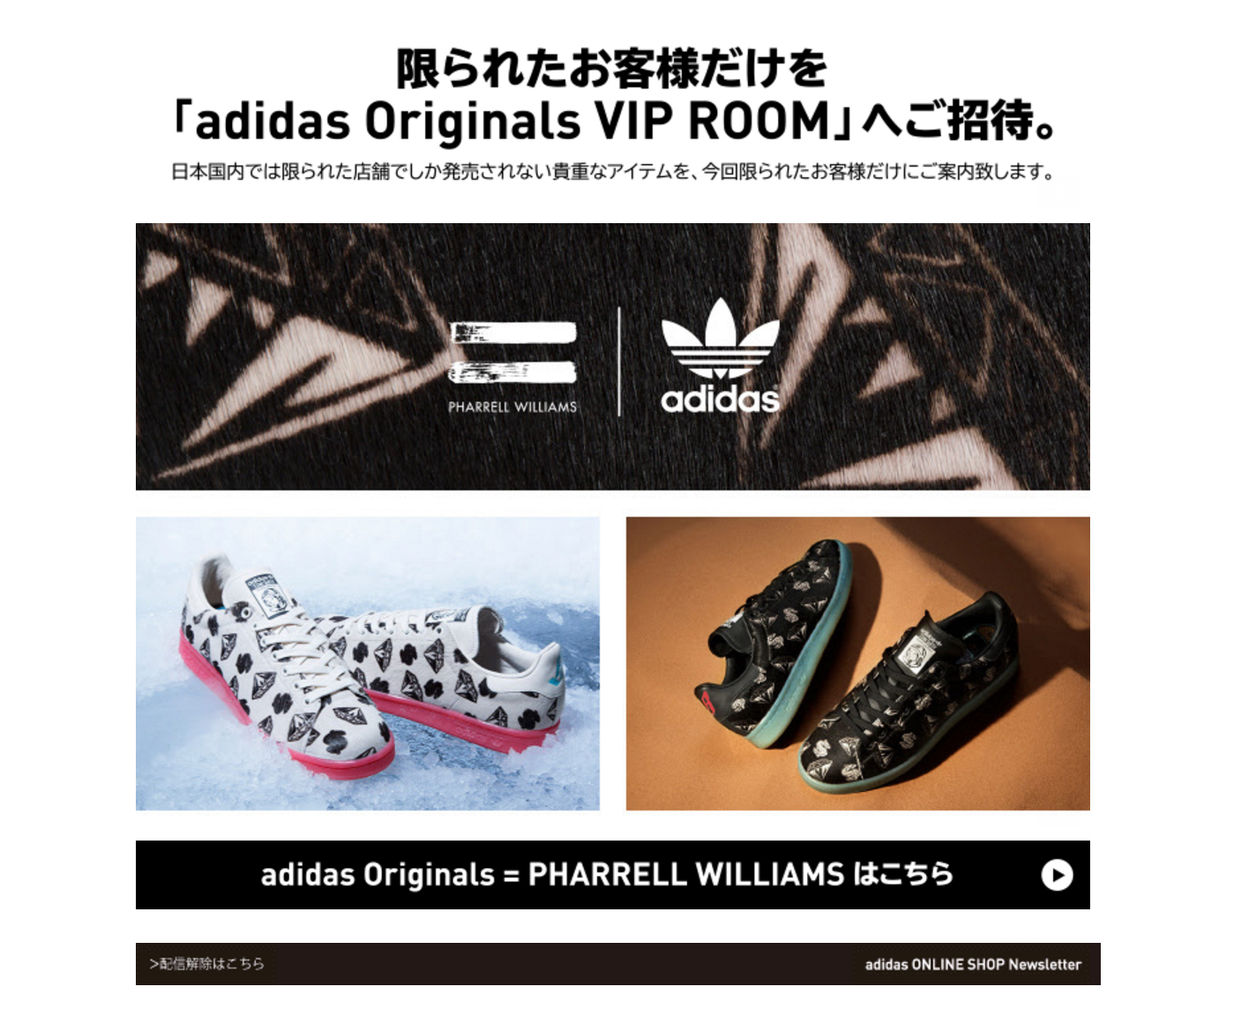 adidas online vip room